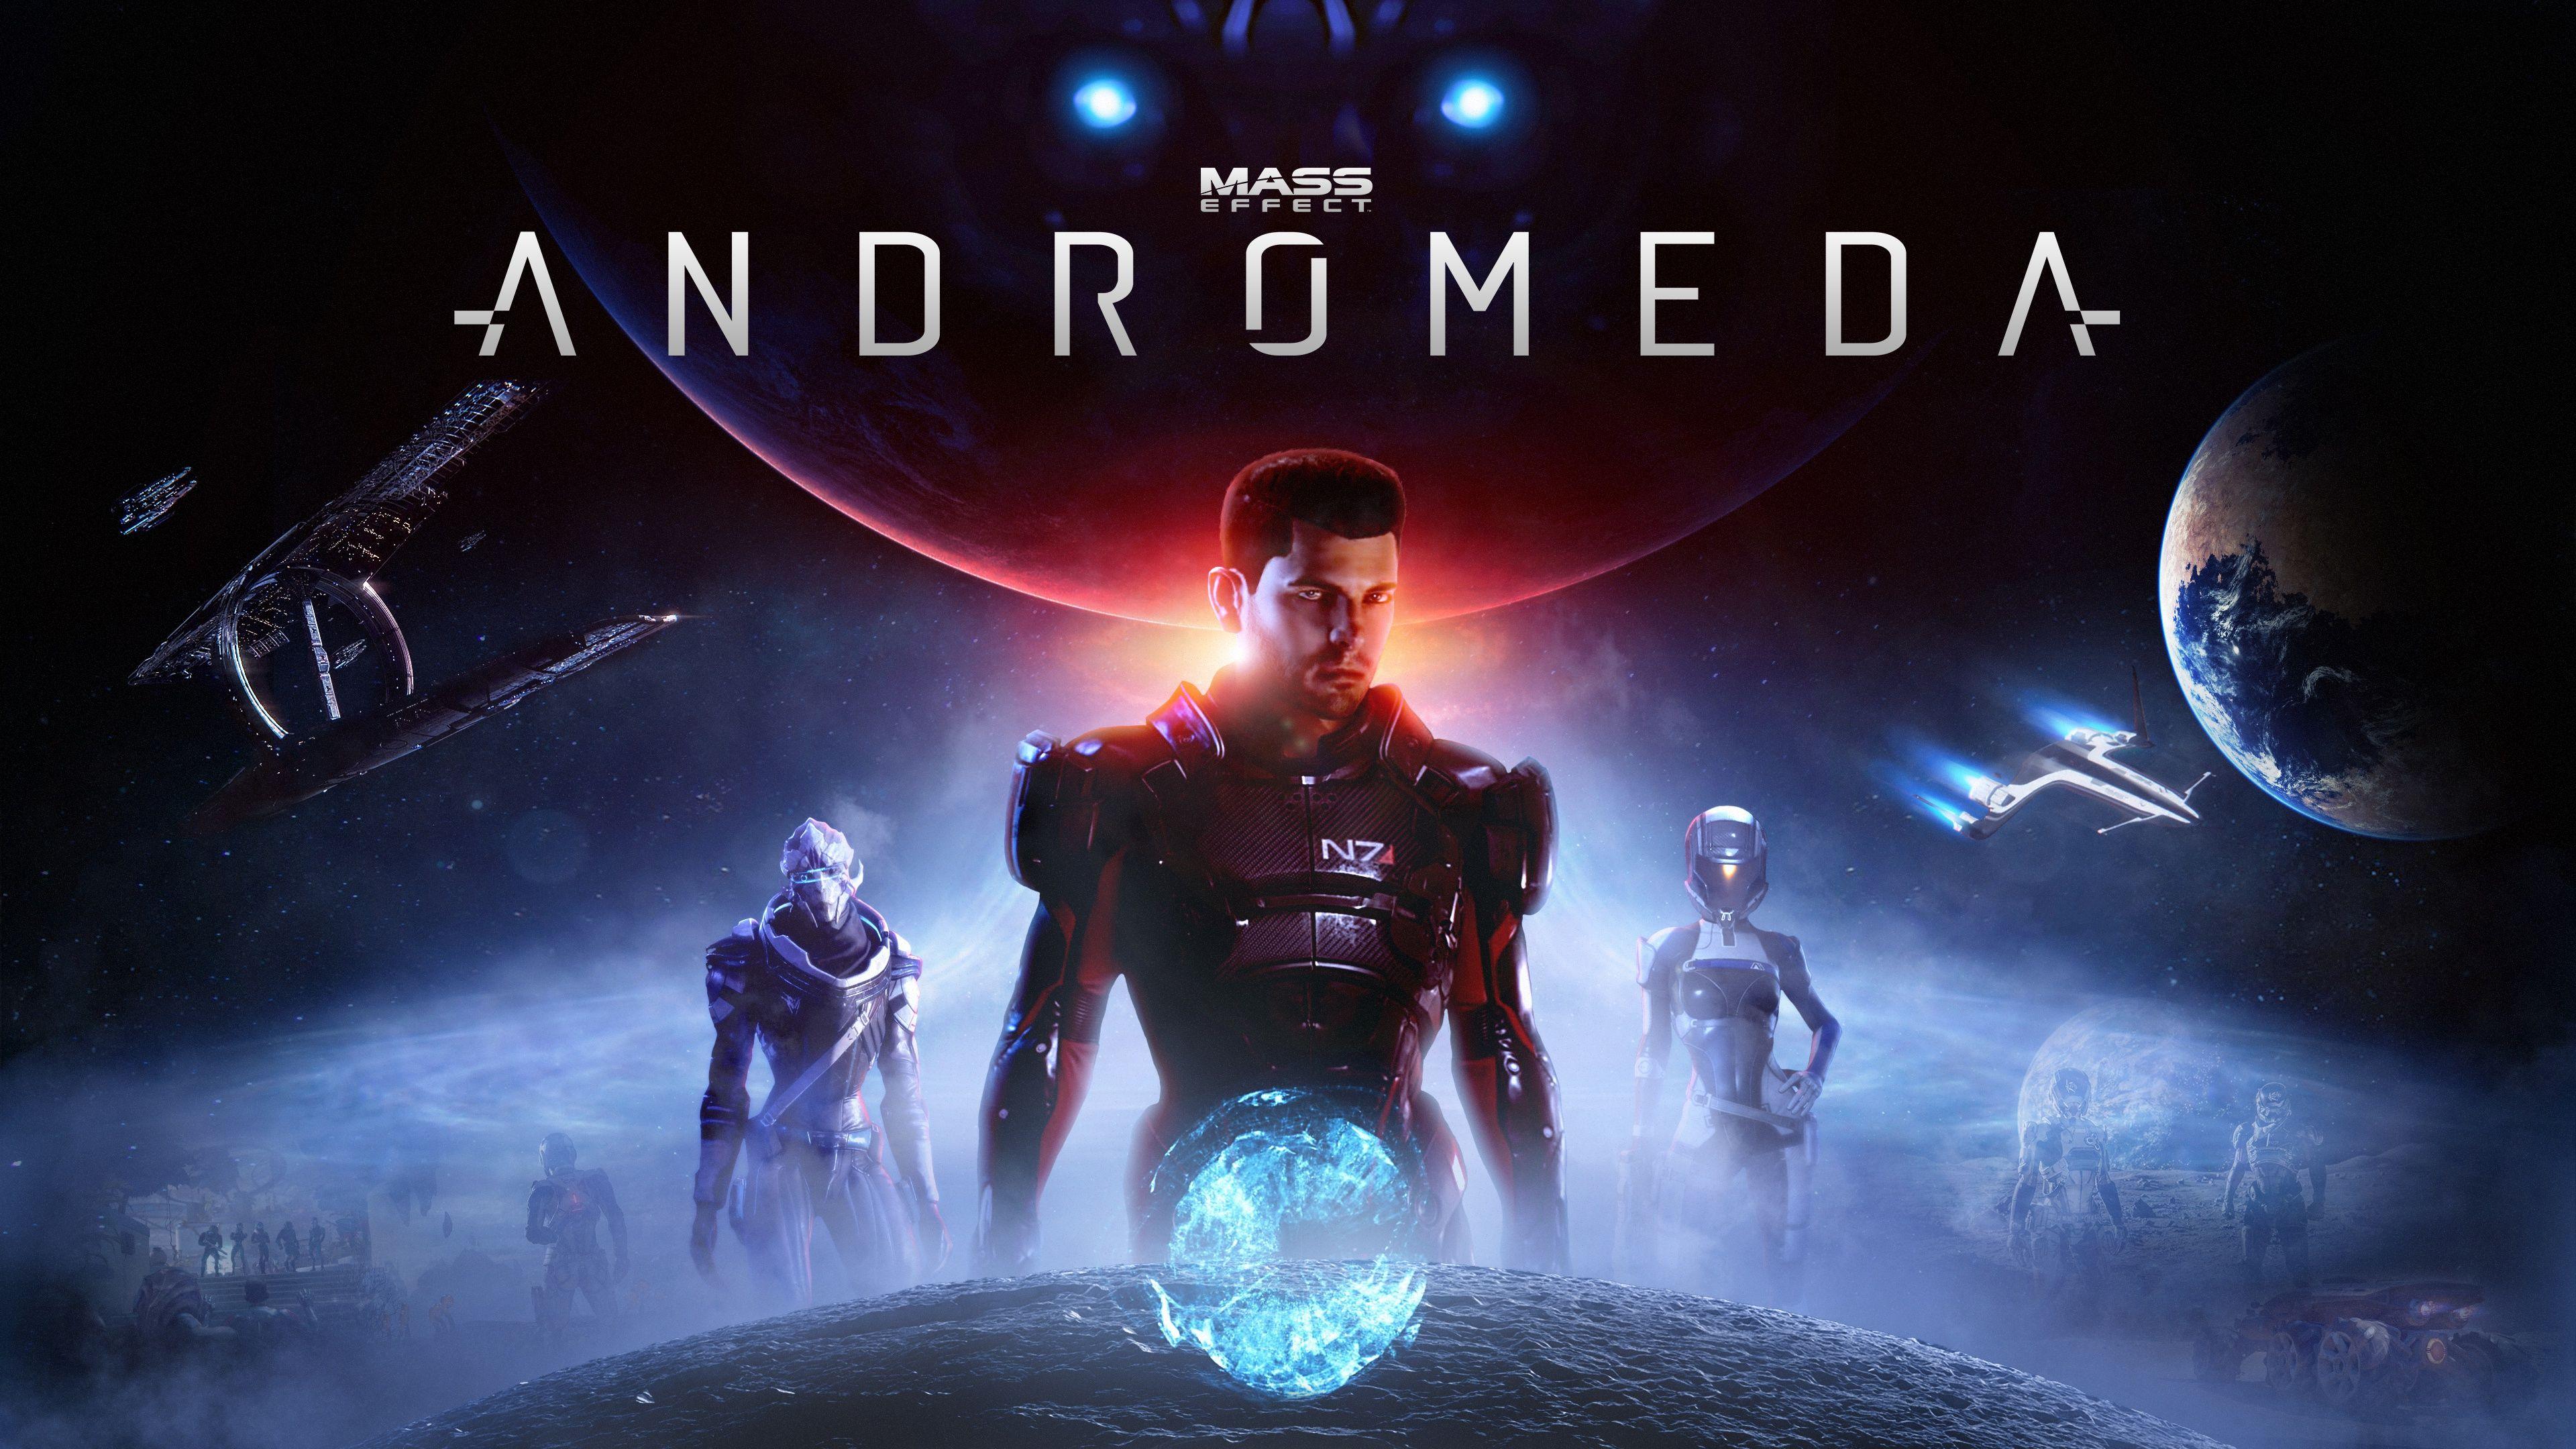 mass effect andromeda 4k 2017 - this hd mass effect andromeda 4k